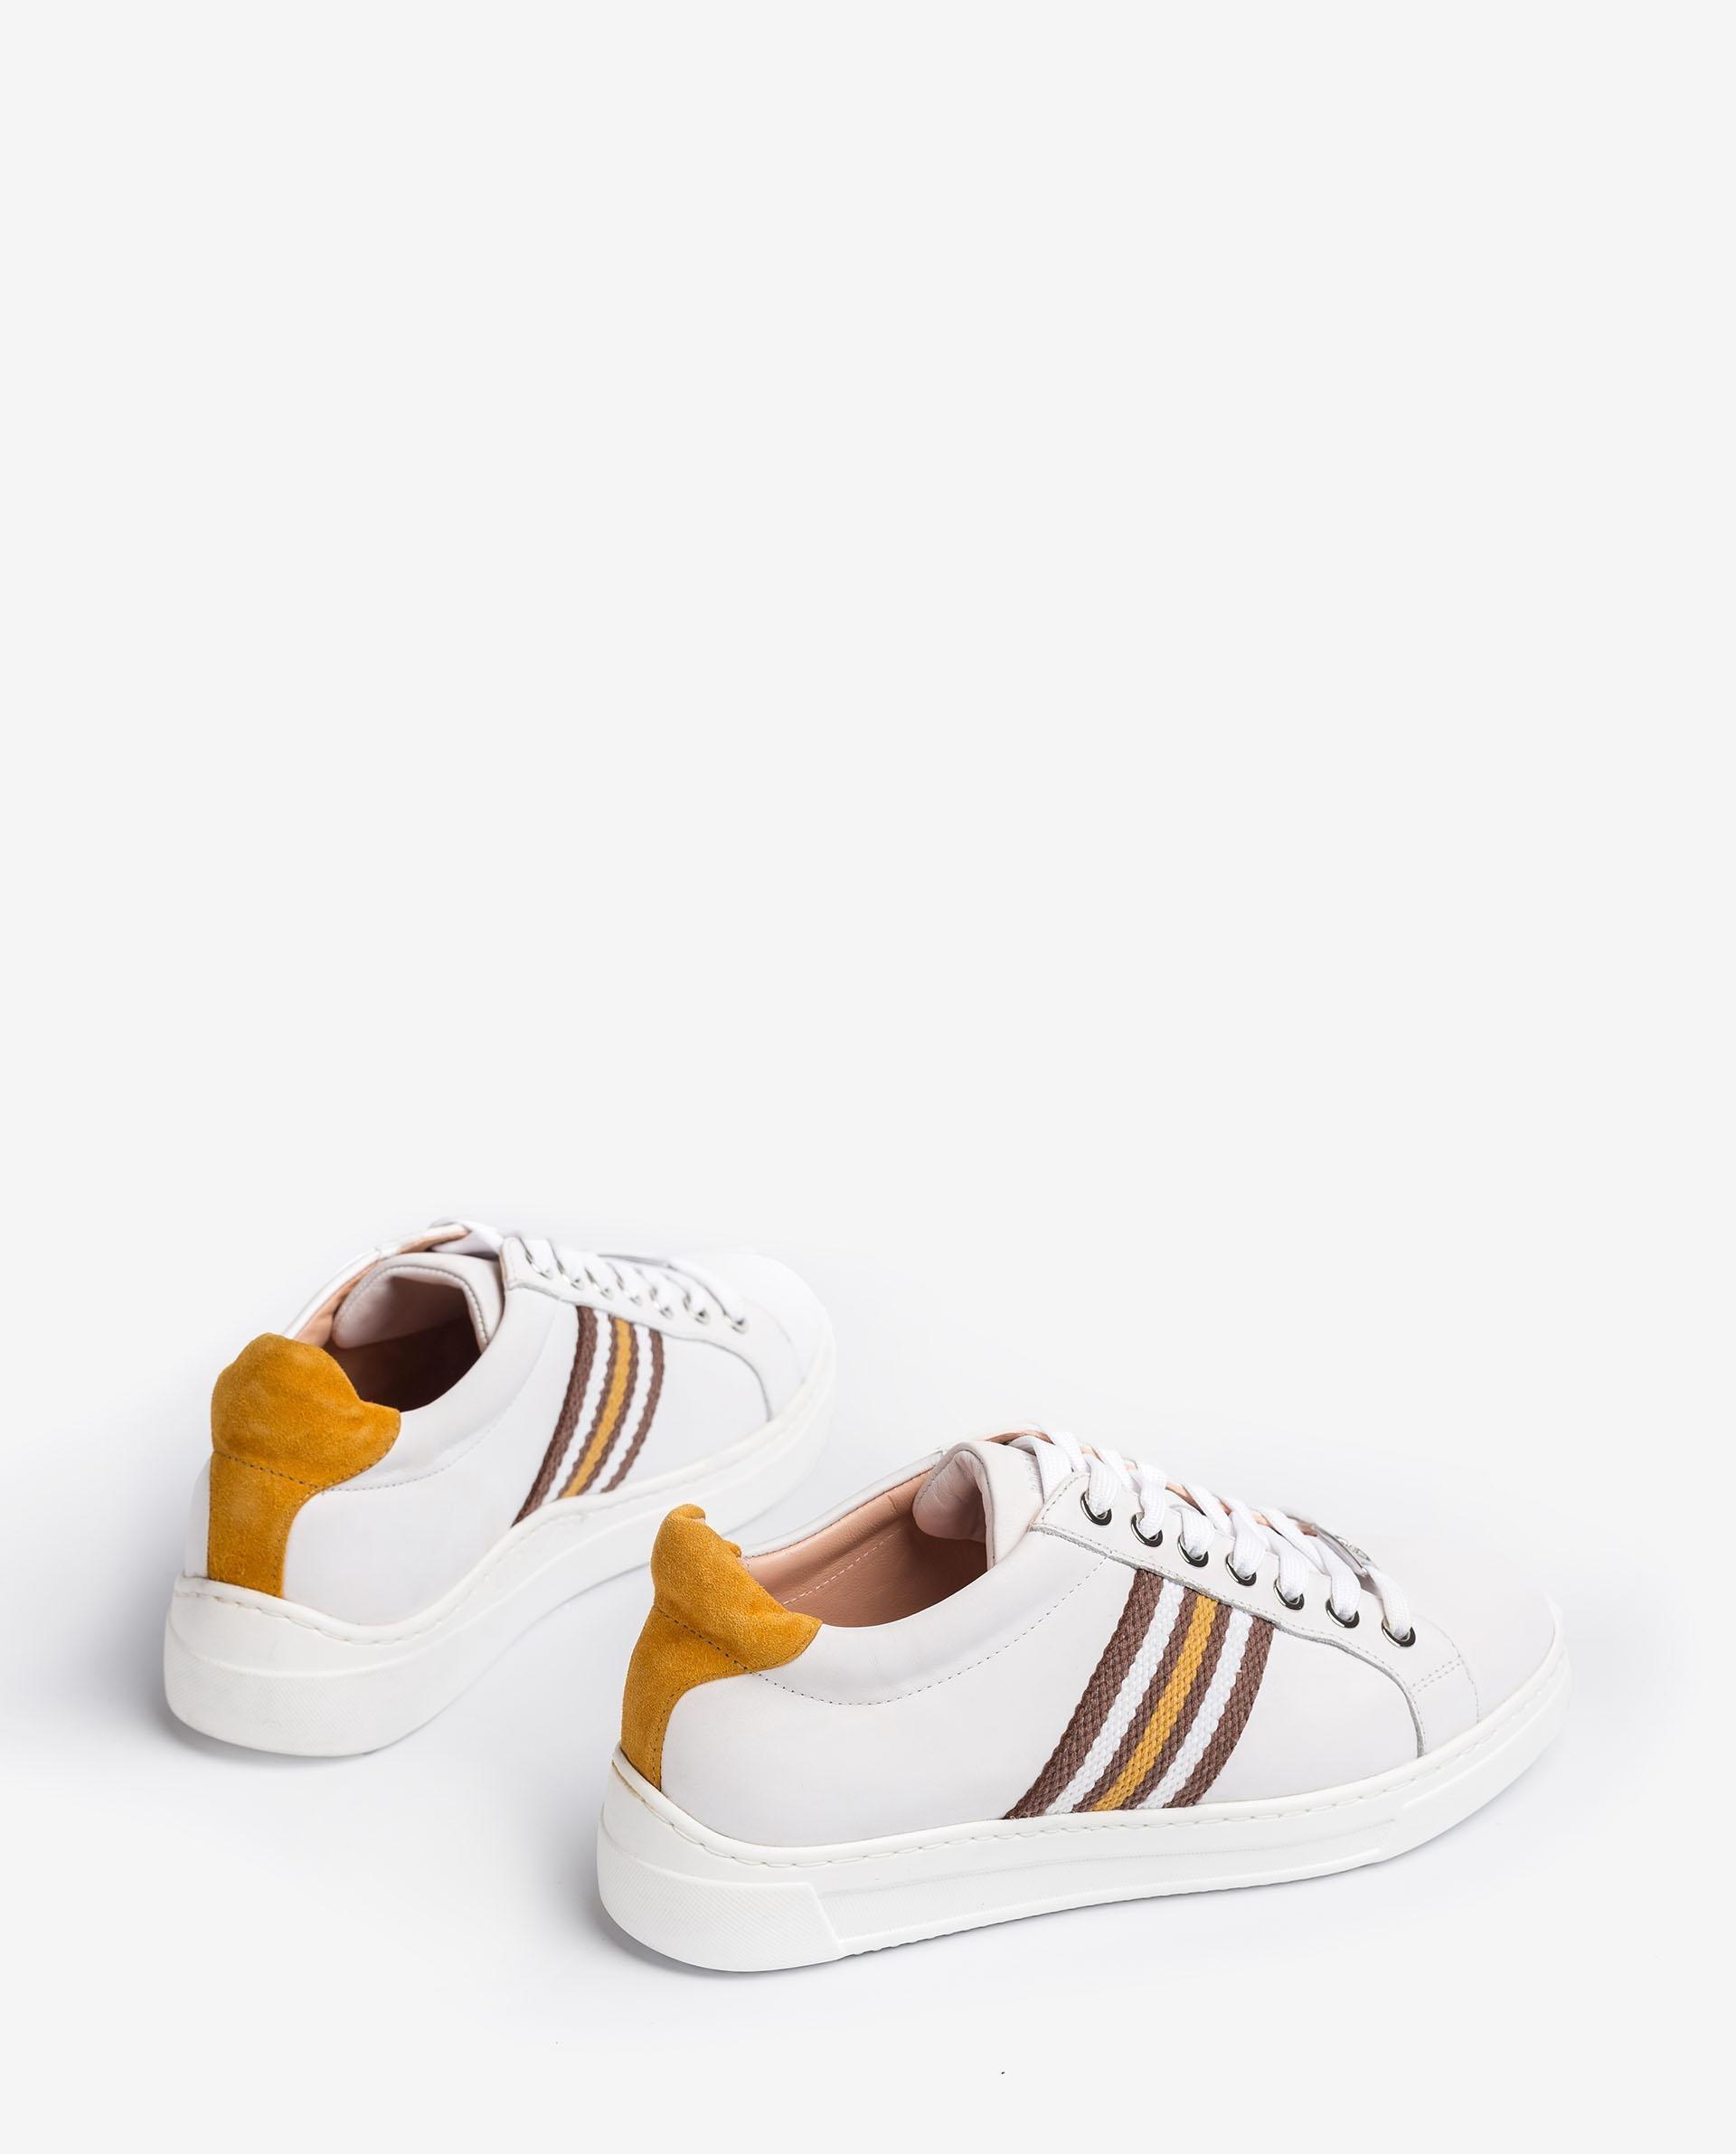 UNISA Chaussure de sport en cuir avec bandes multicolores  FAROLA_21_NF 3